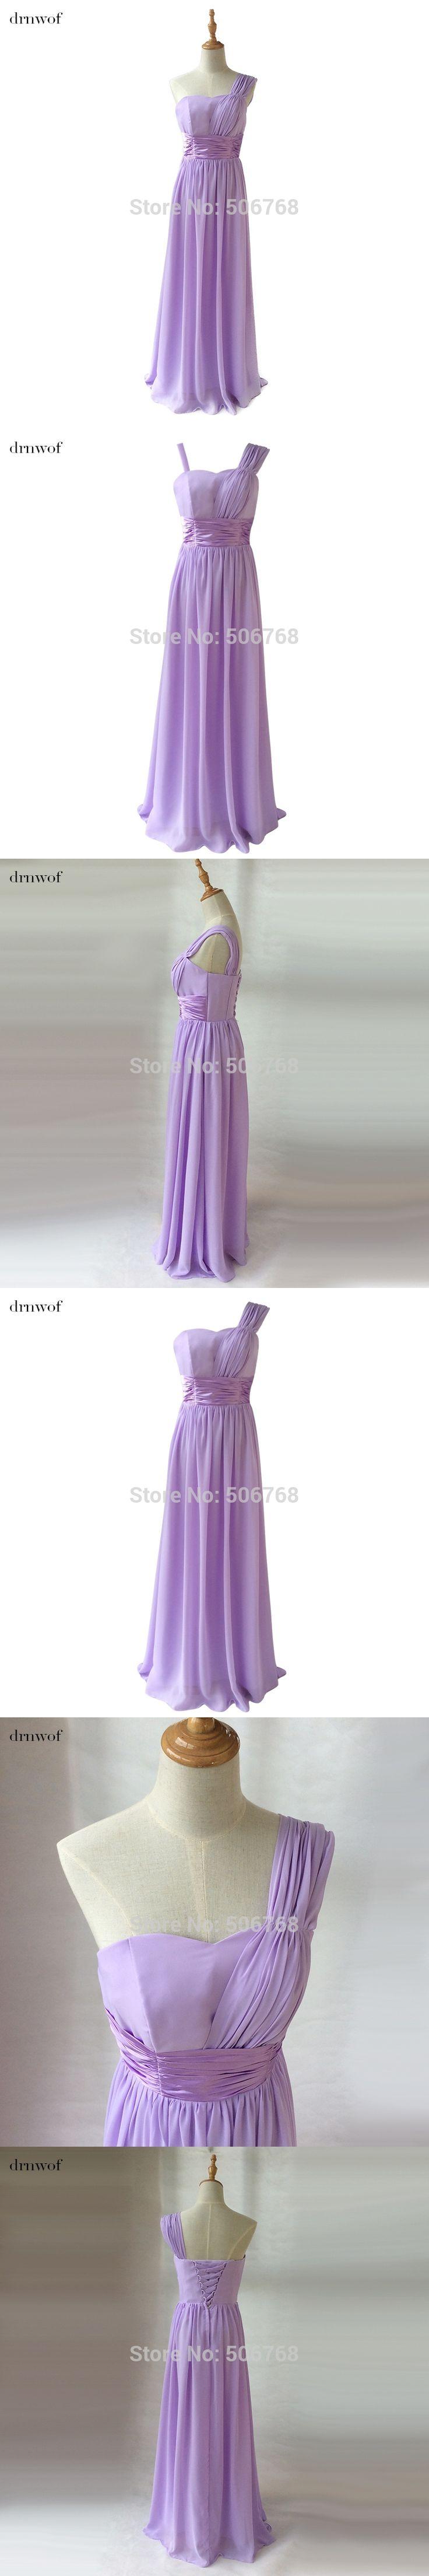 drnwof New Chiffon Ligth Purple Bridesmaid Dresses Long Cheap under 50 One Shoulder A-Line Sweetheart Wedding Party Dress Sale